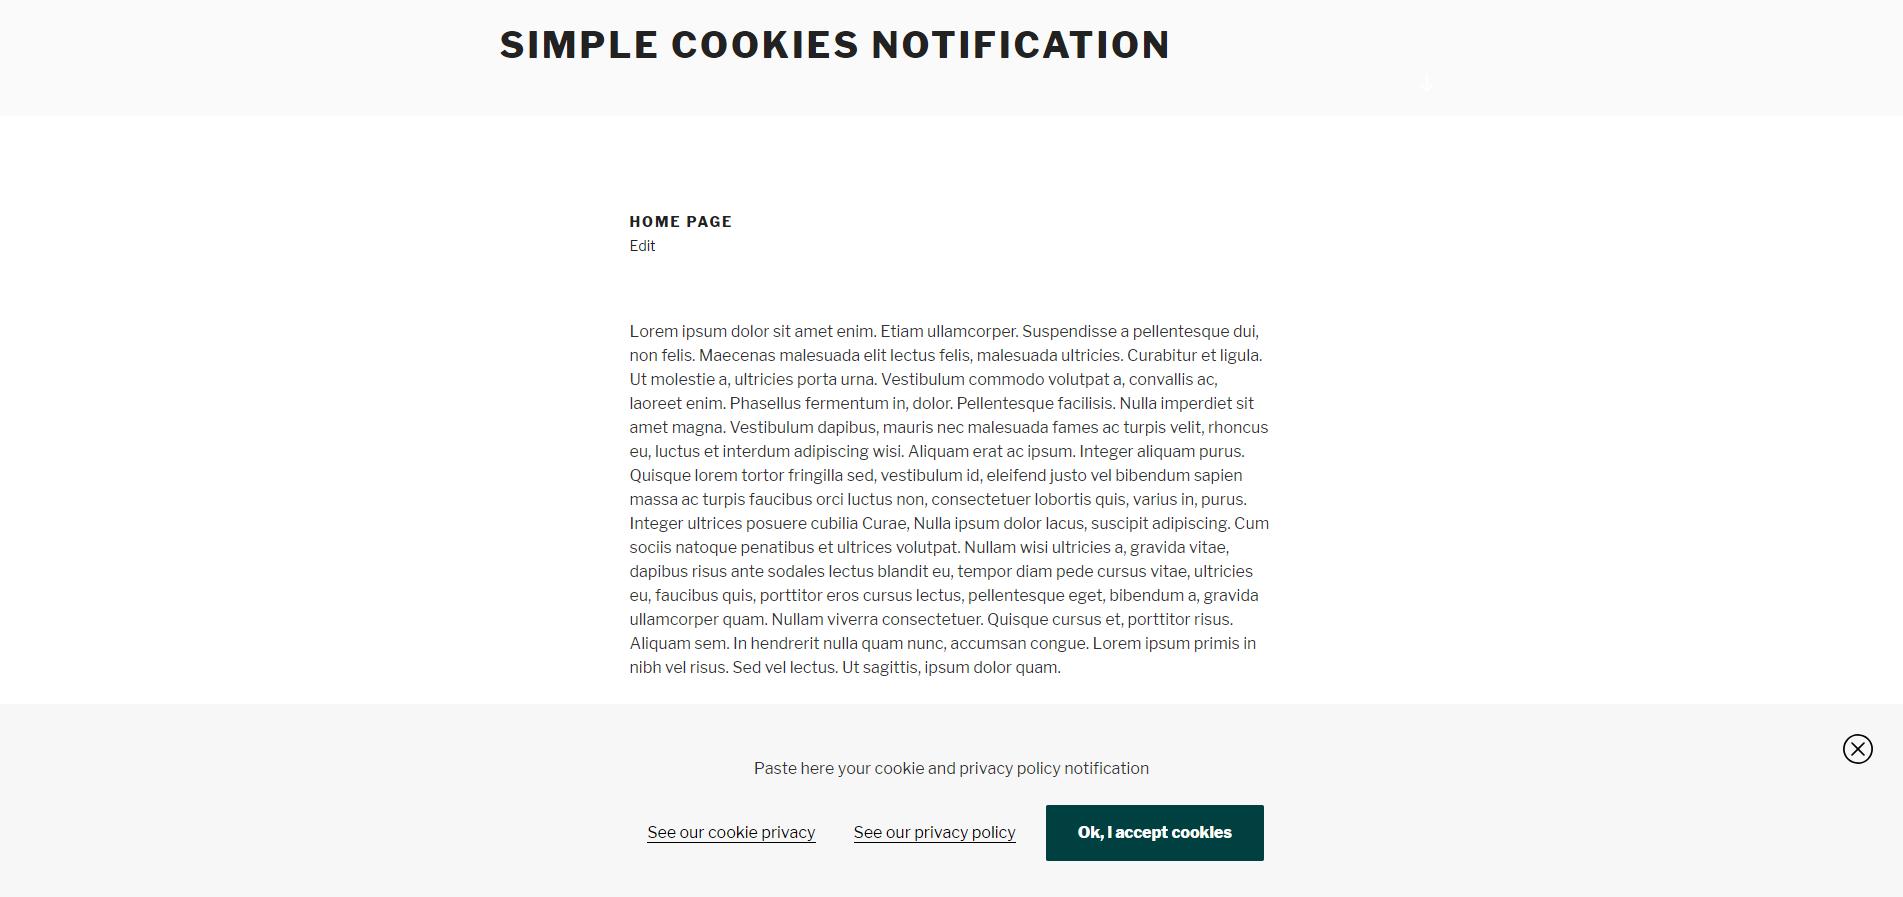 Cookie notification bar.